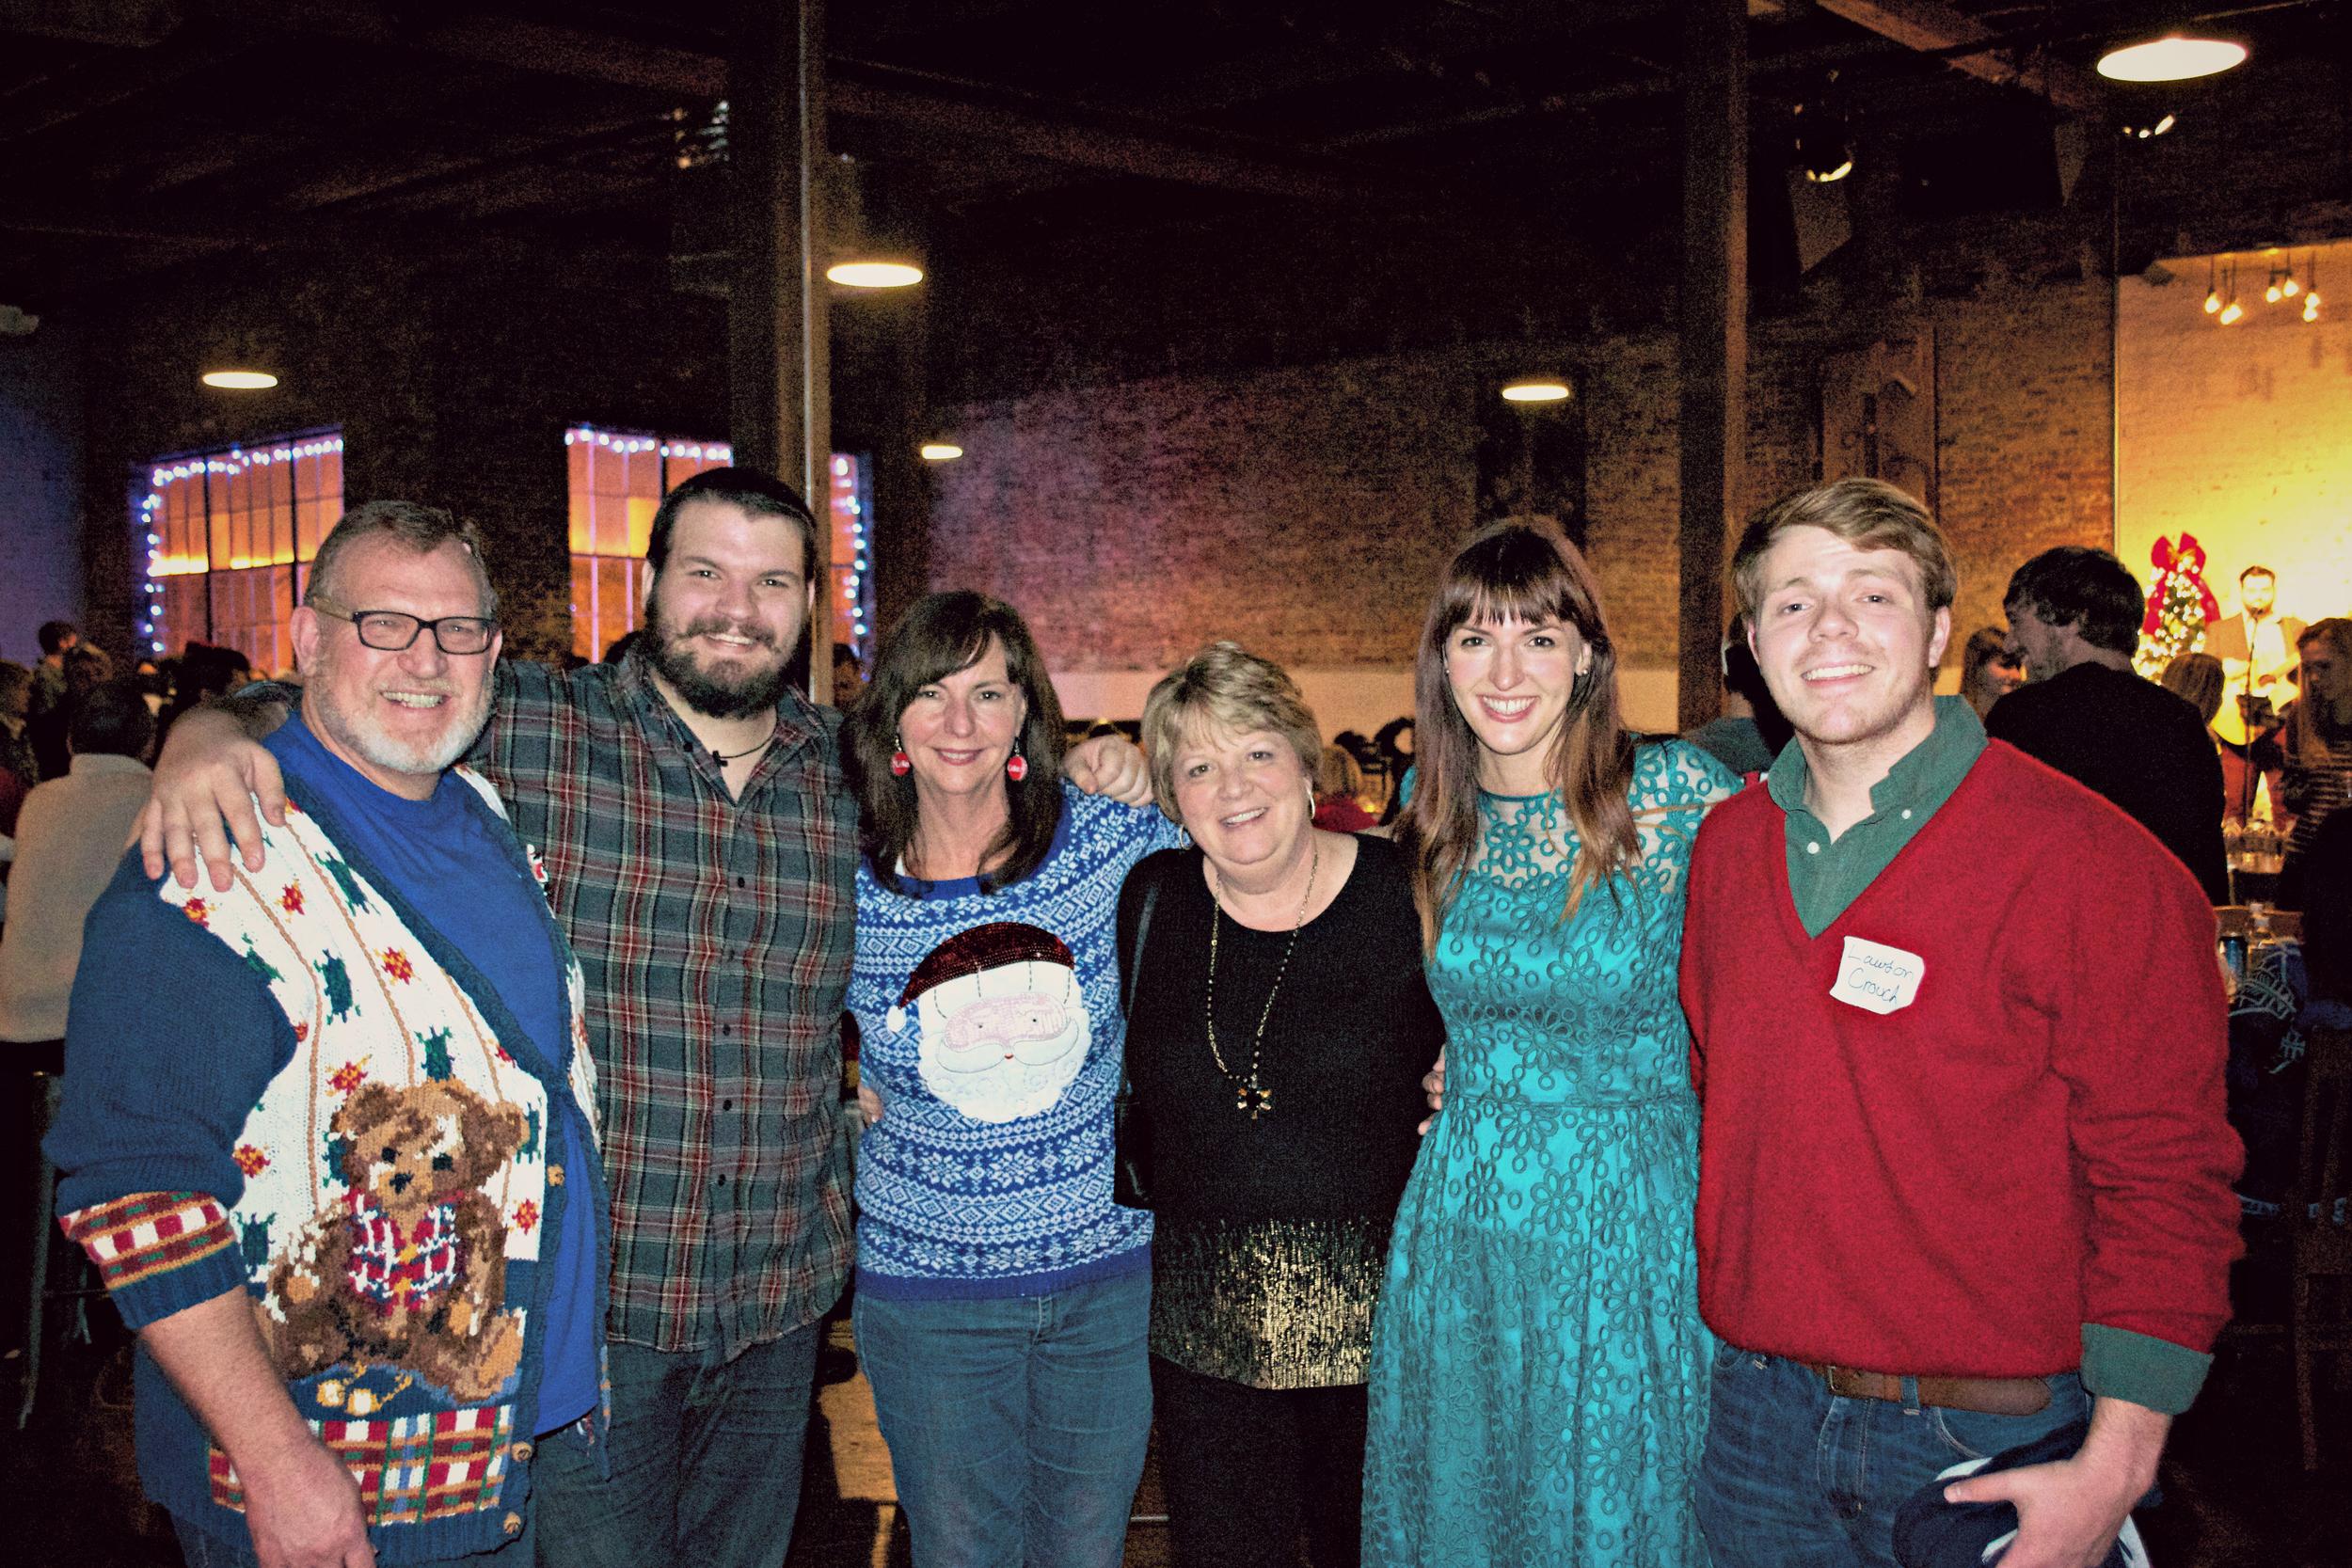 pucketts-family-christmas